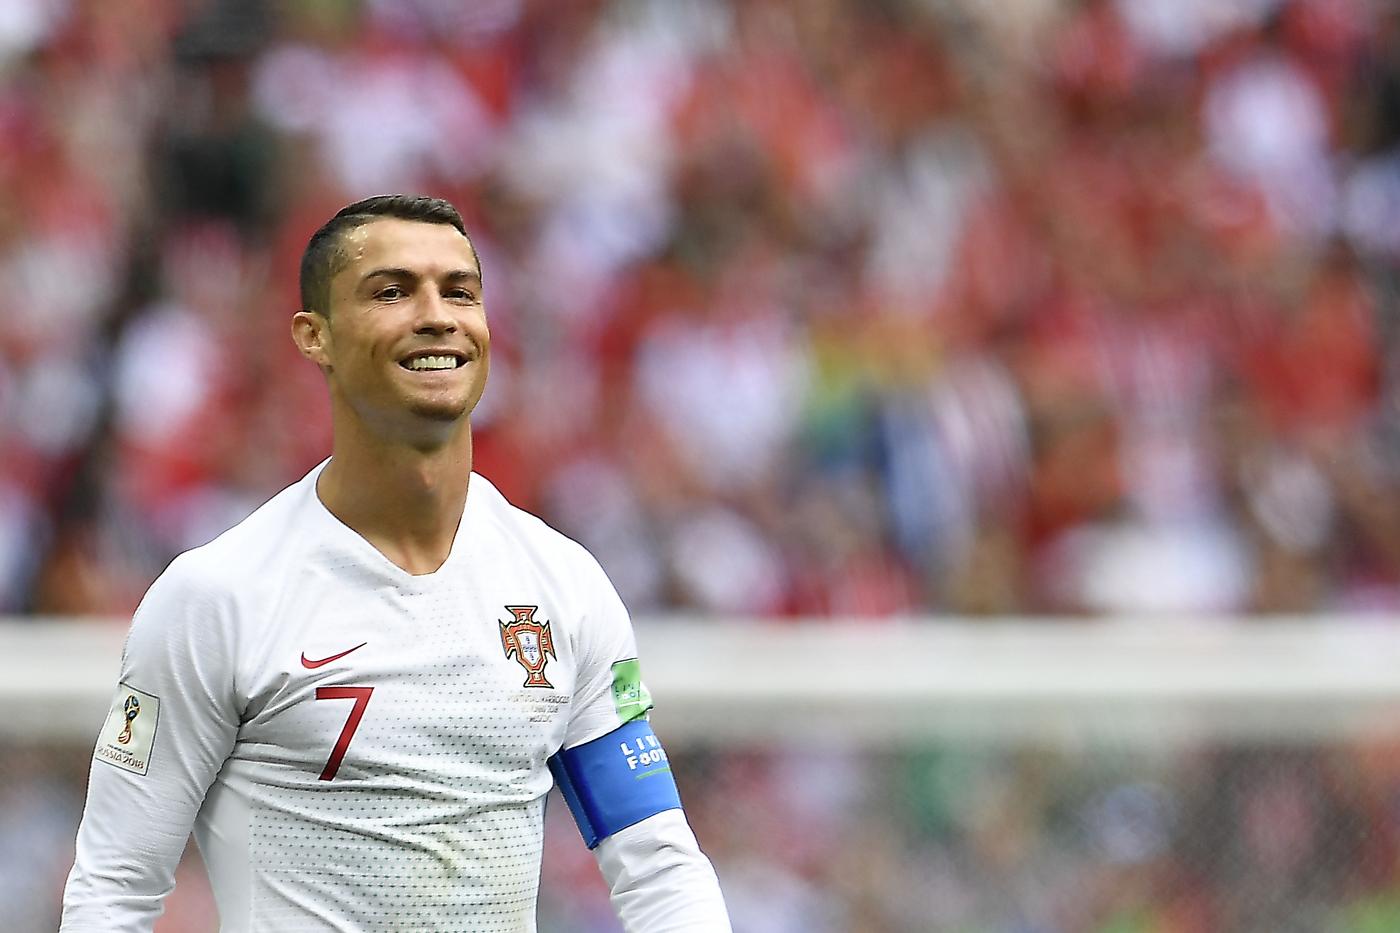 Portogallo-Lussemburgo 11 ottobre: pronostico qualificazioni Europei